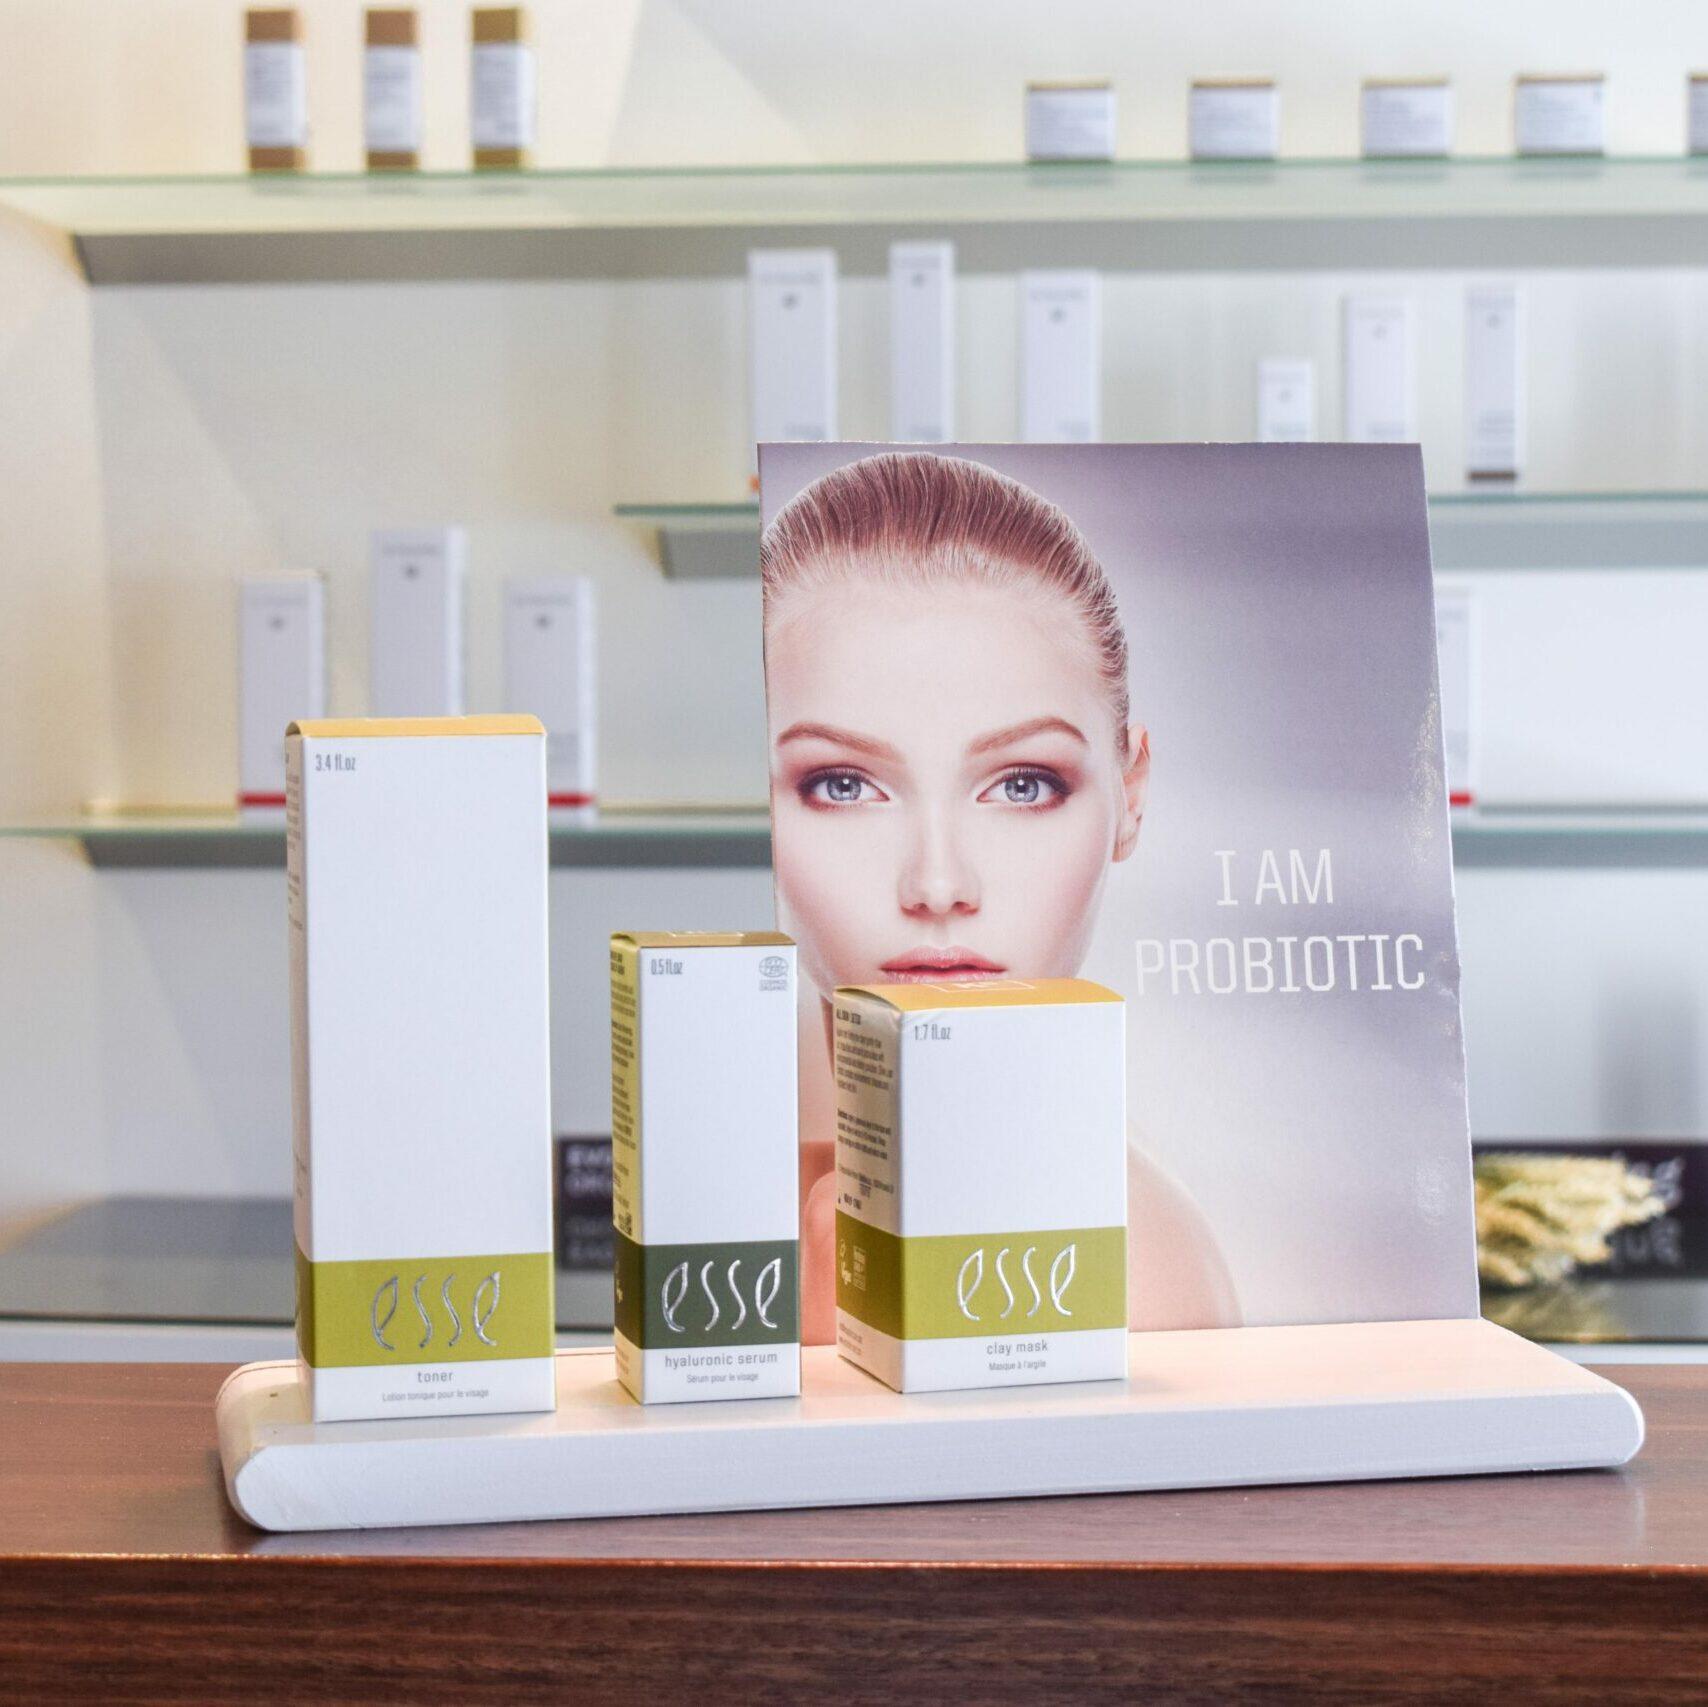 Salon-heike-esse-skincare-huidverzorging